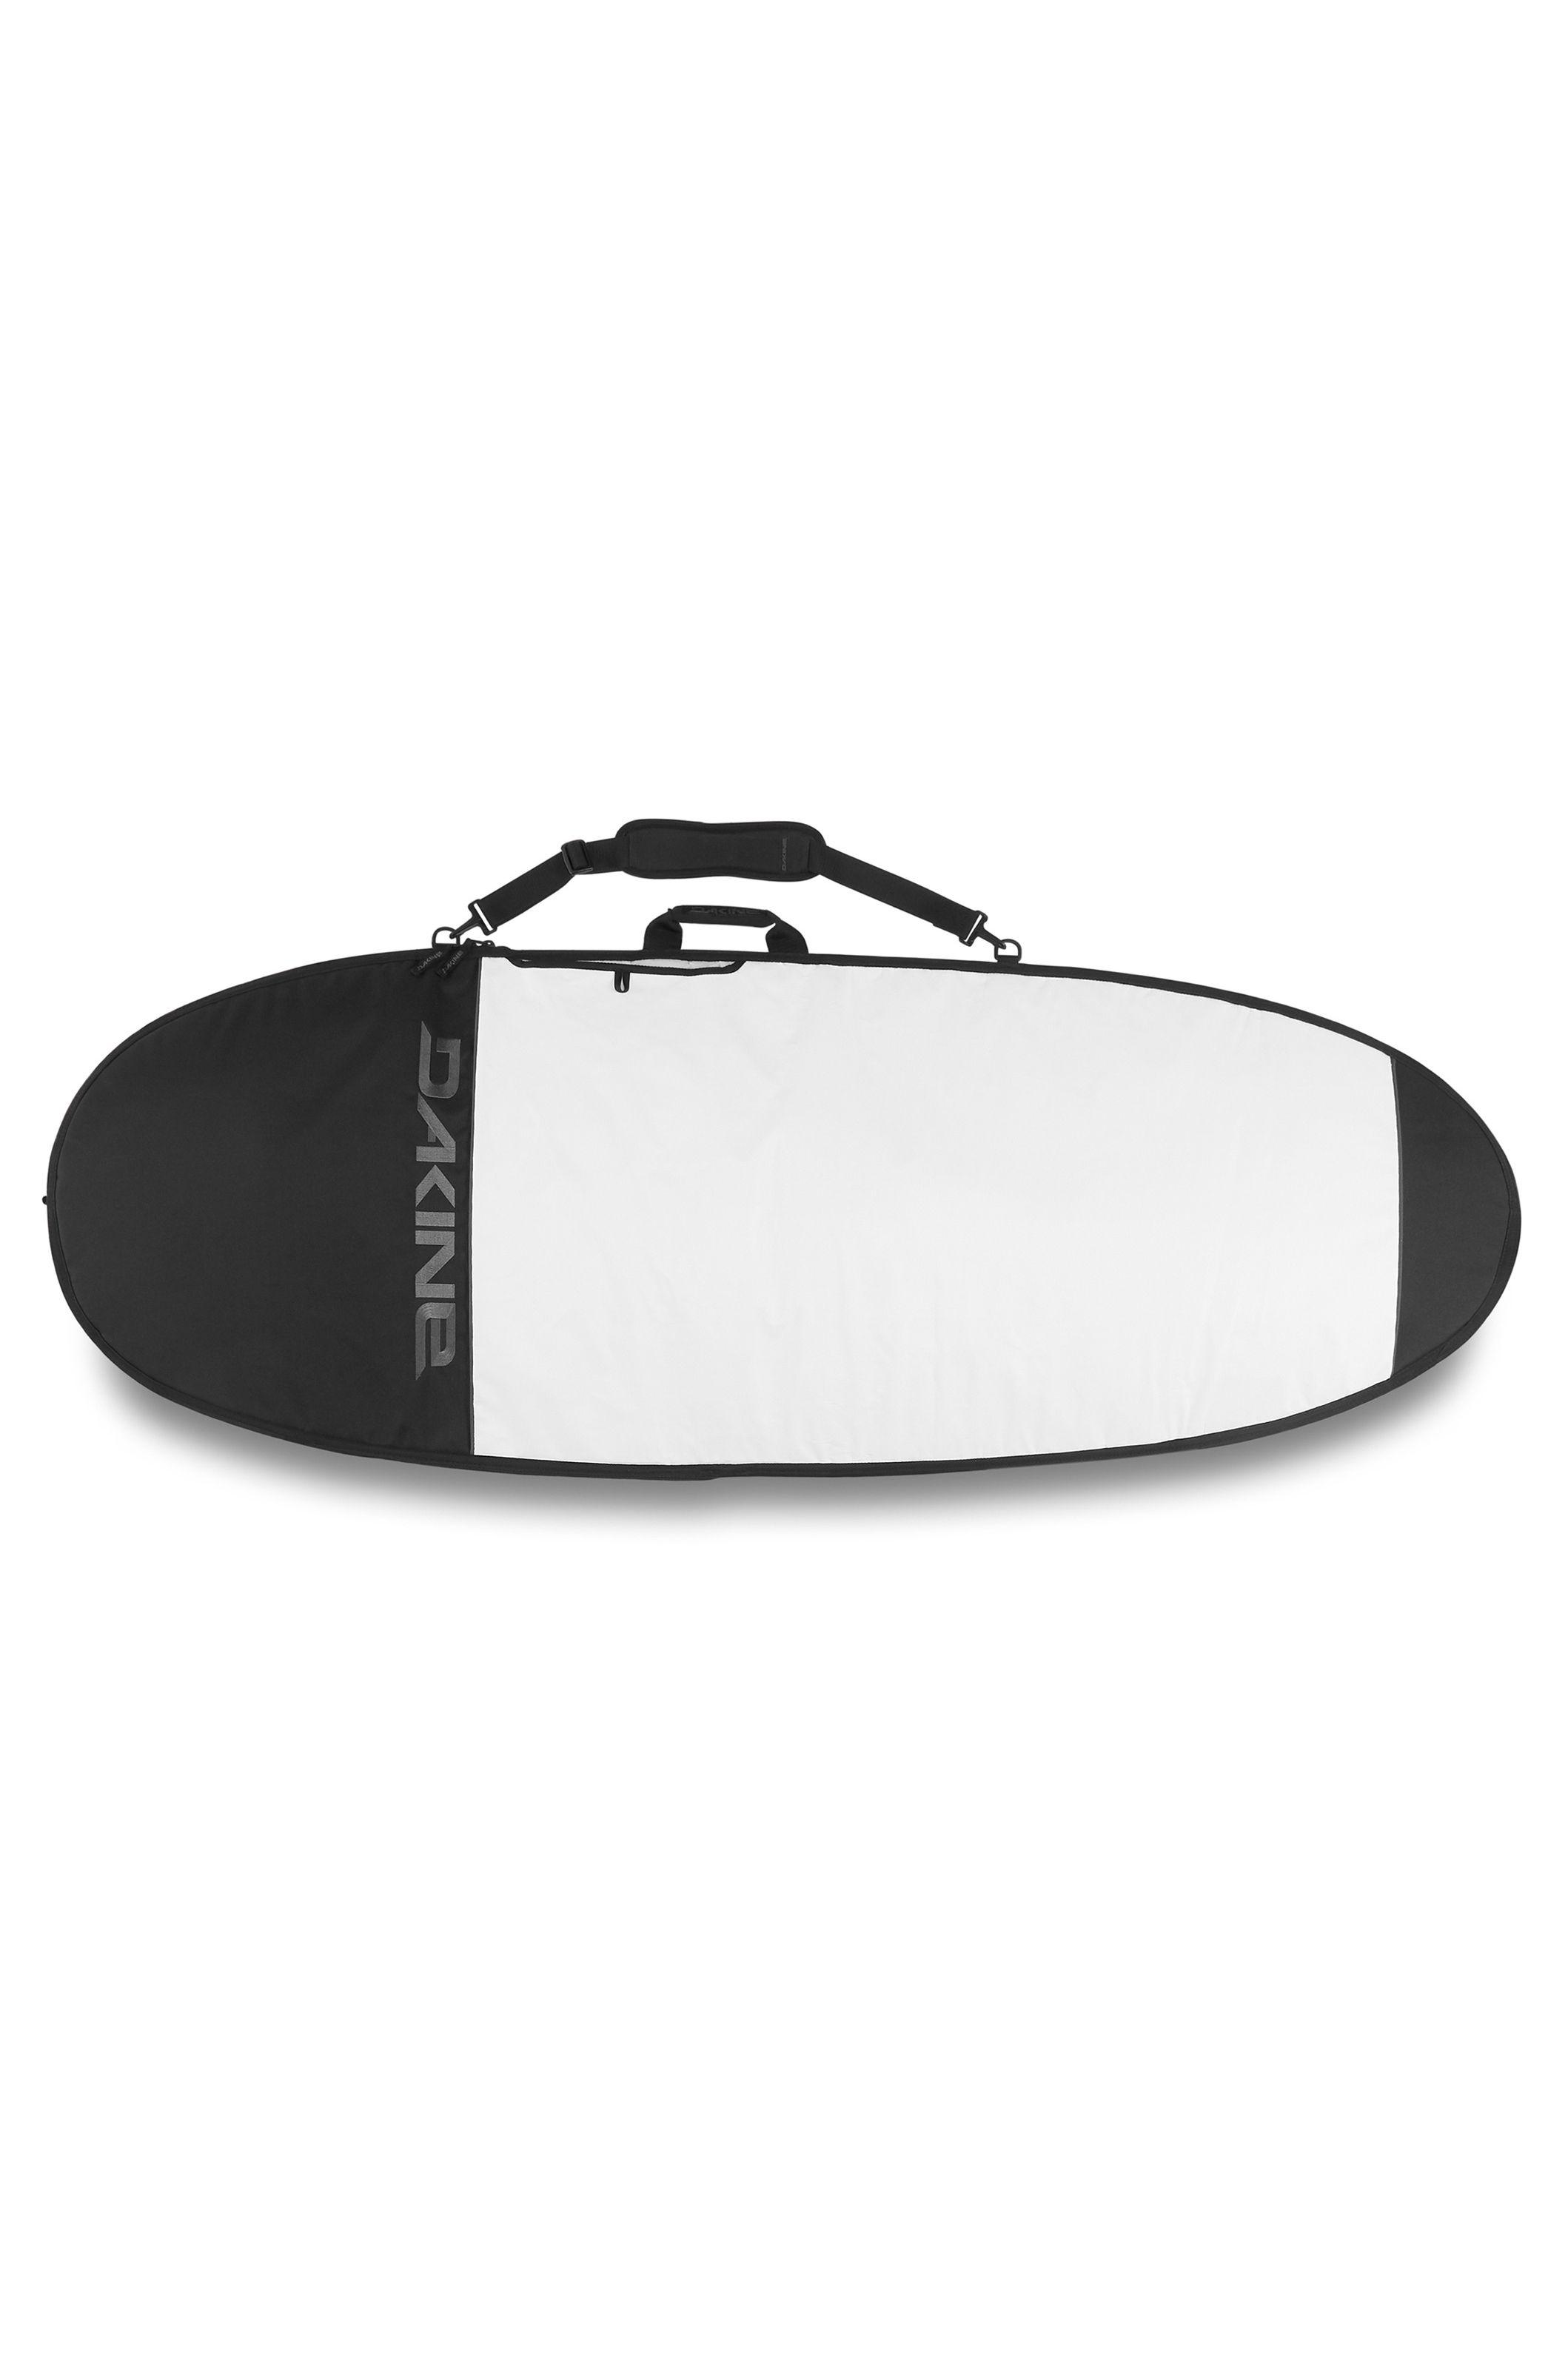 Dakine Boardbag 7'0 DAYLIGHT SURFBOARD BAG HYBRID White